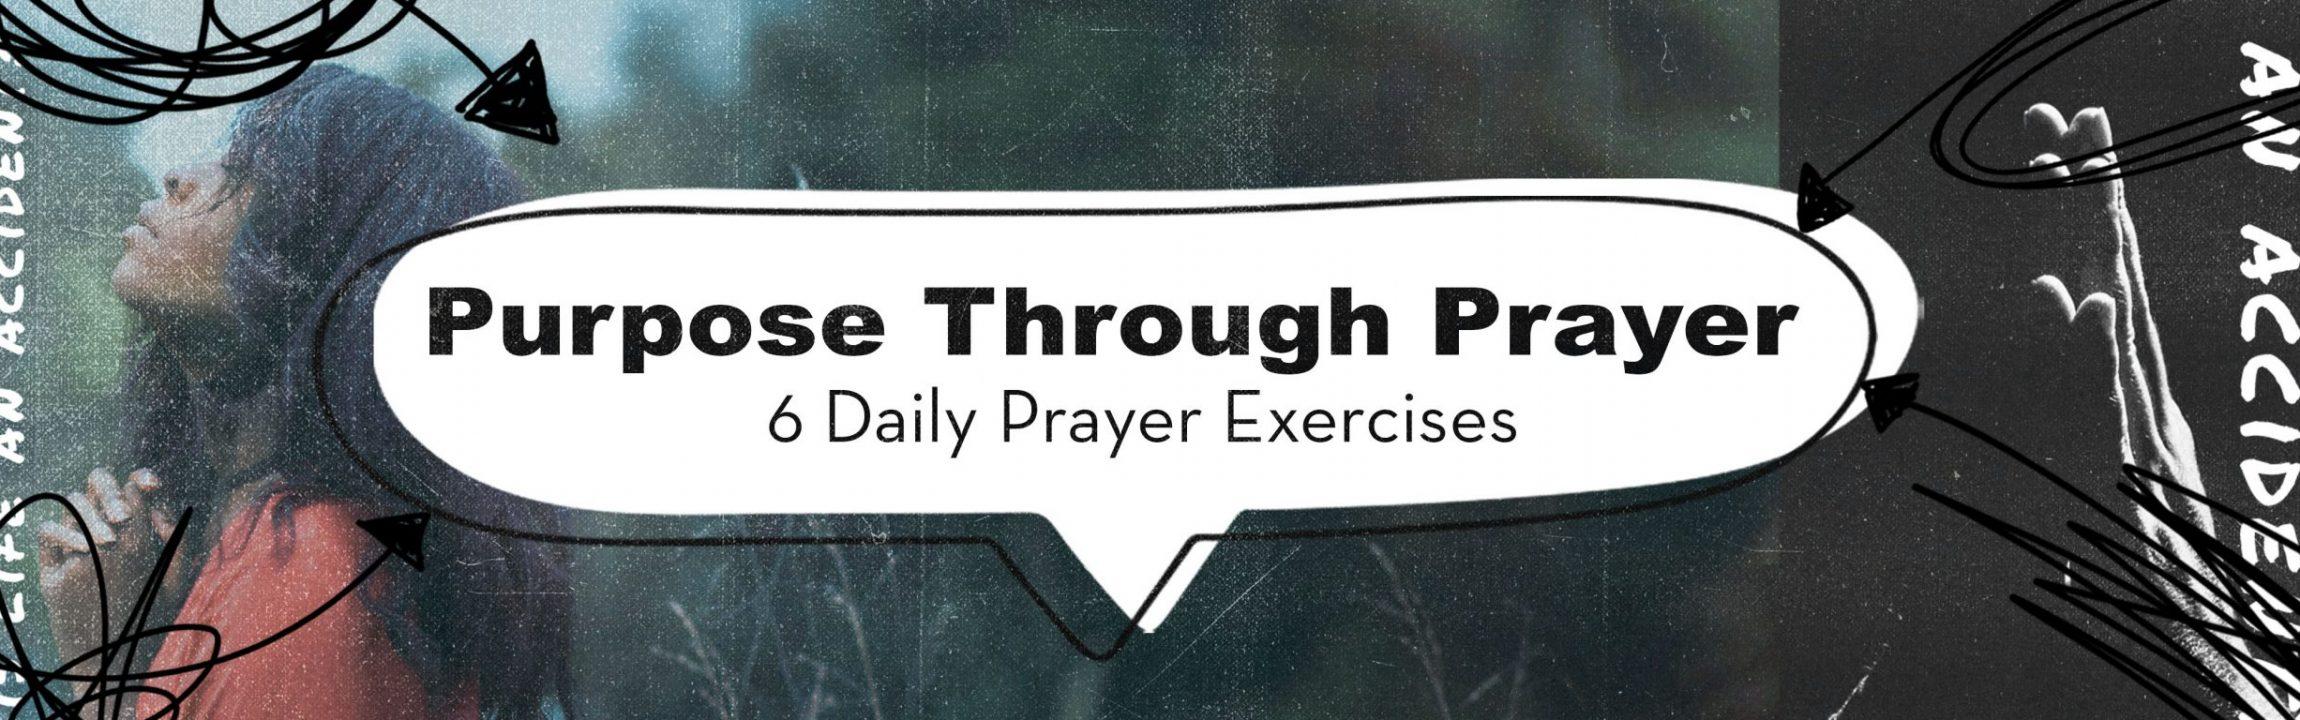 Purpose through Prayer - Feature